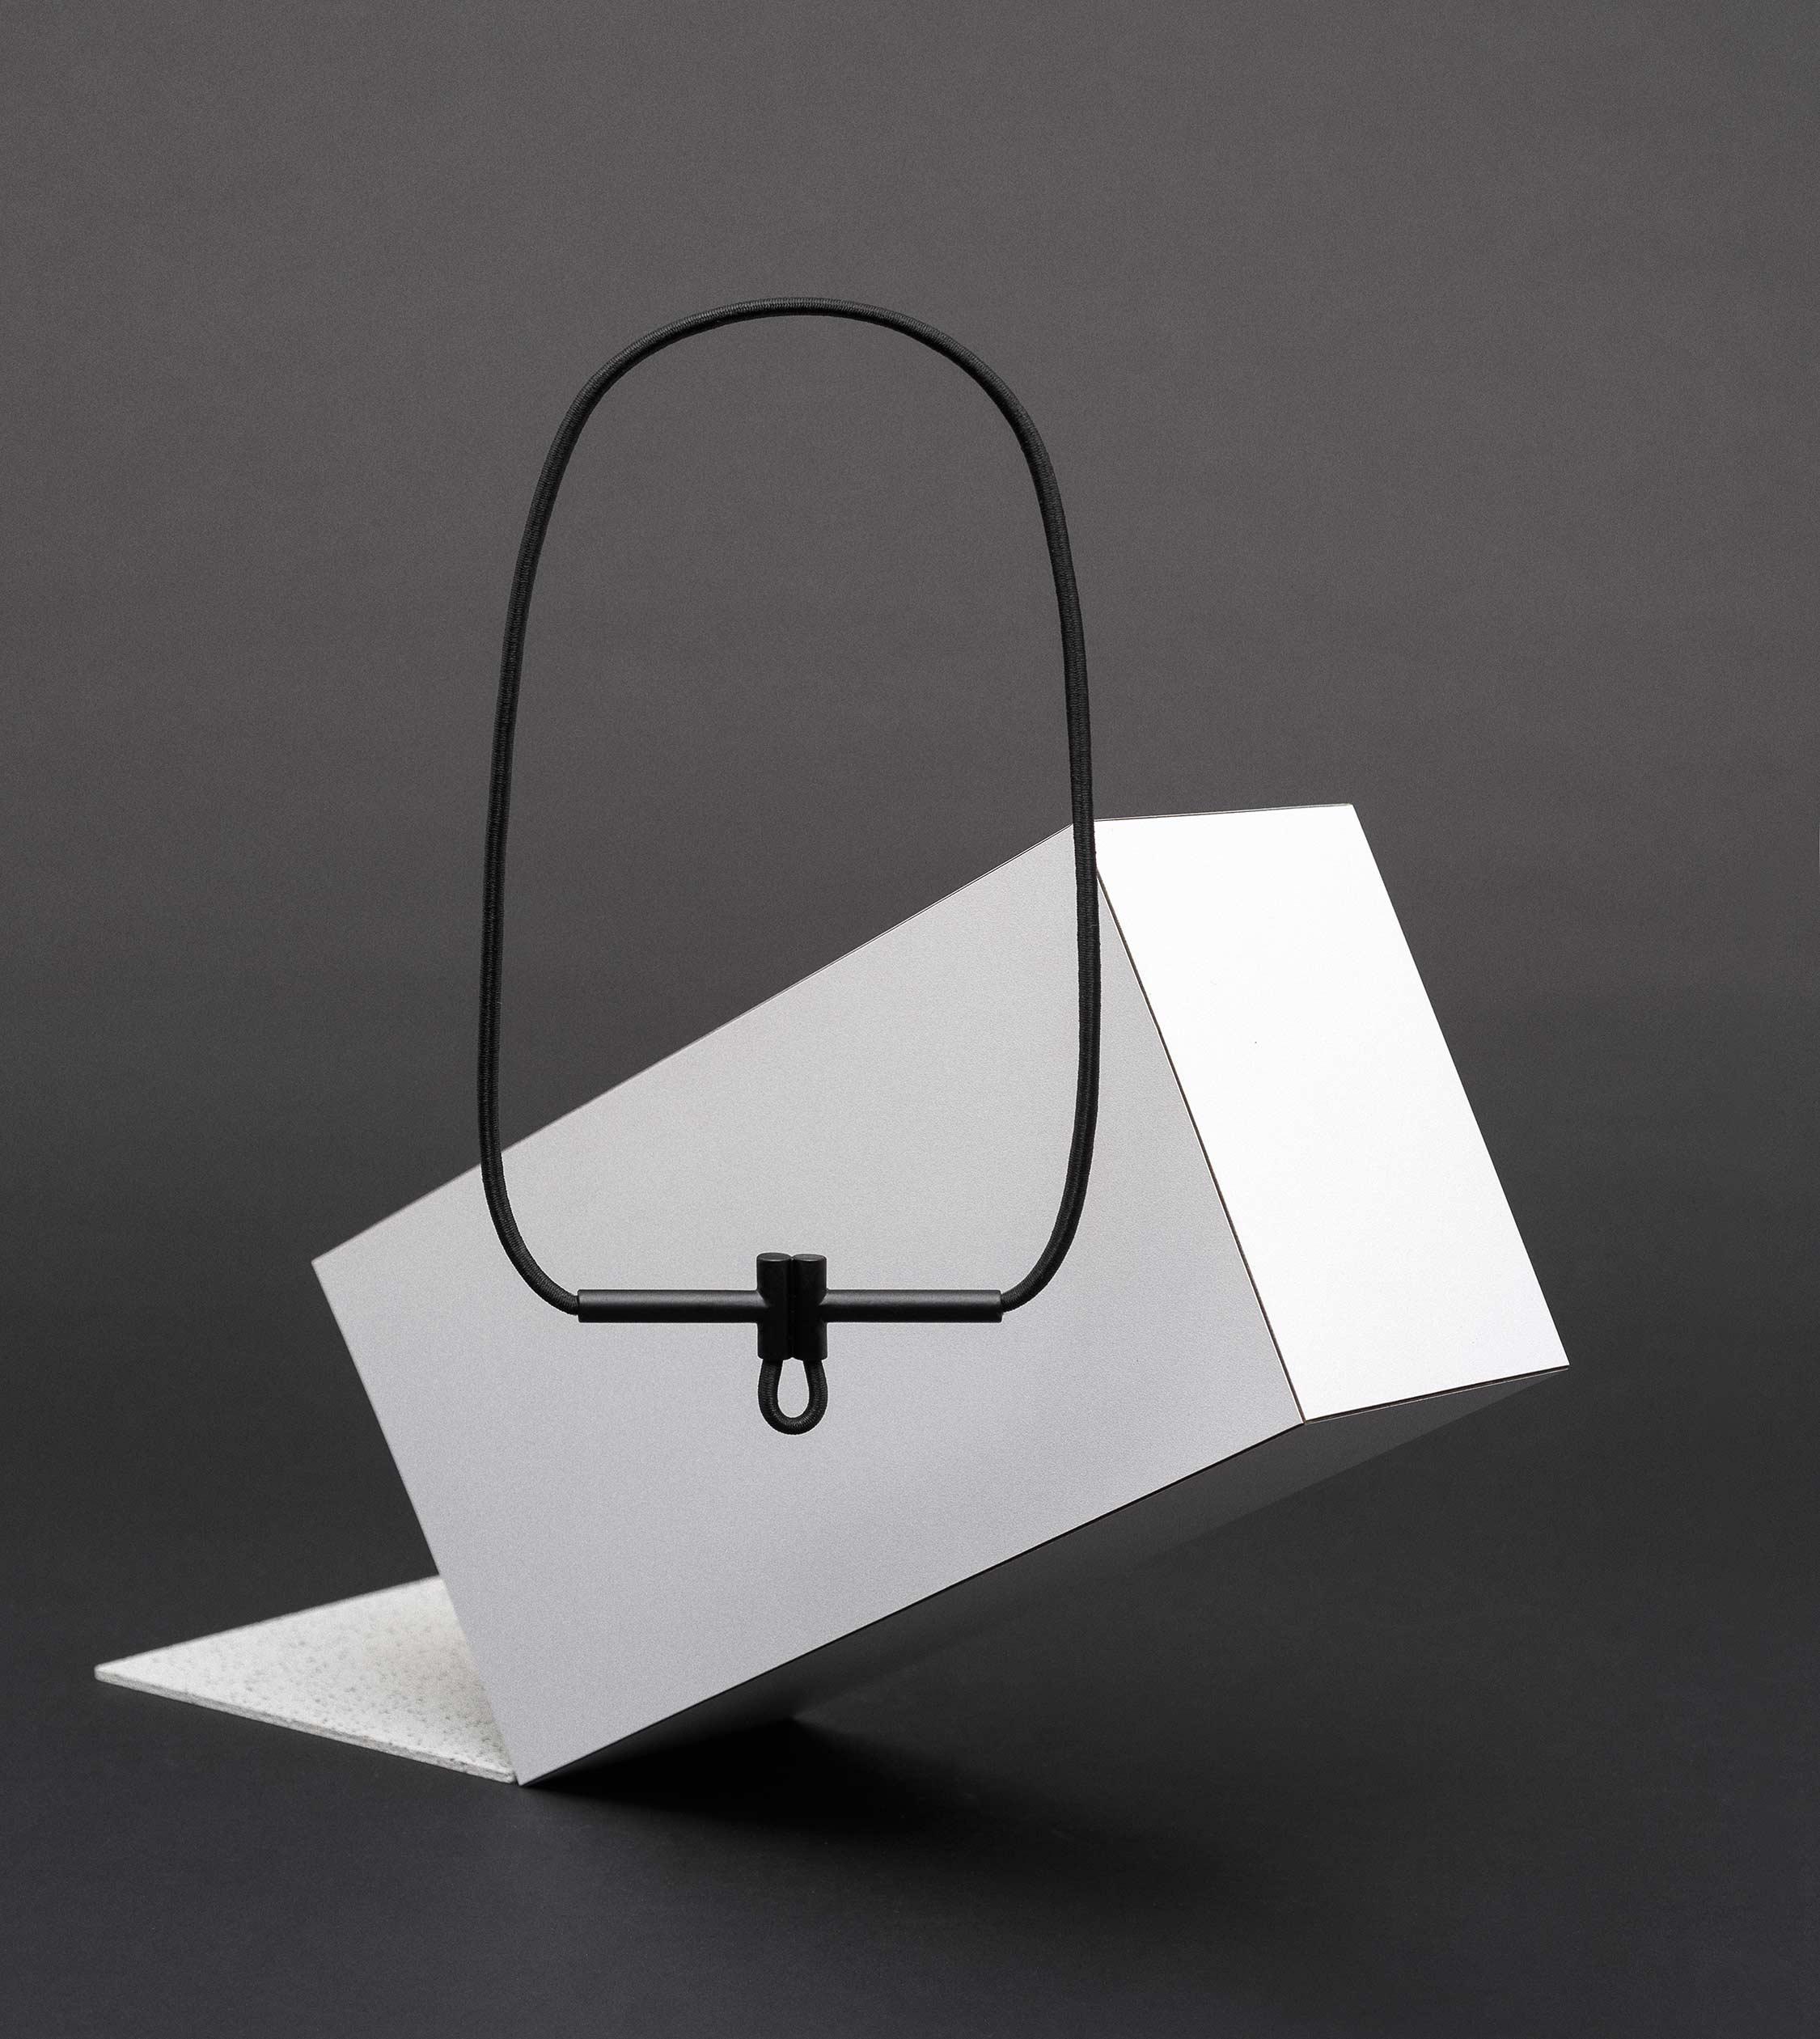 ONA_Collection_Agathe_Palavioux_Maud_Beauchamp_model_no_24